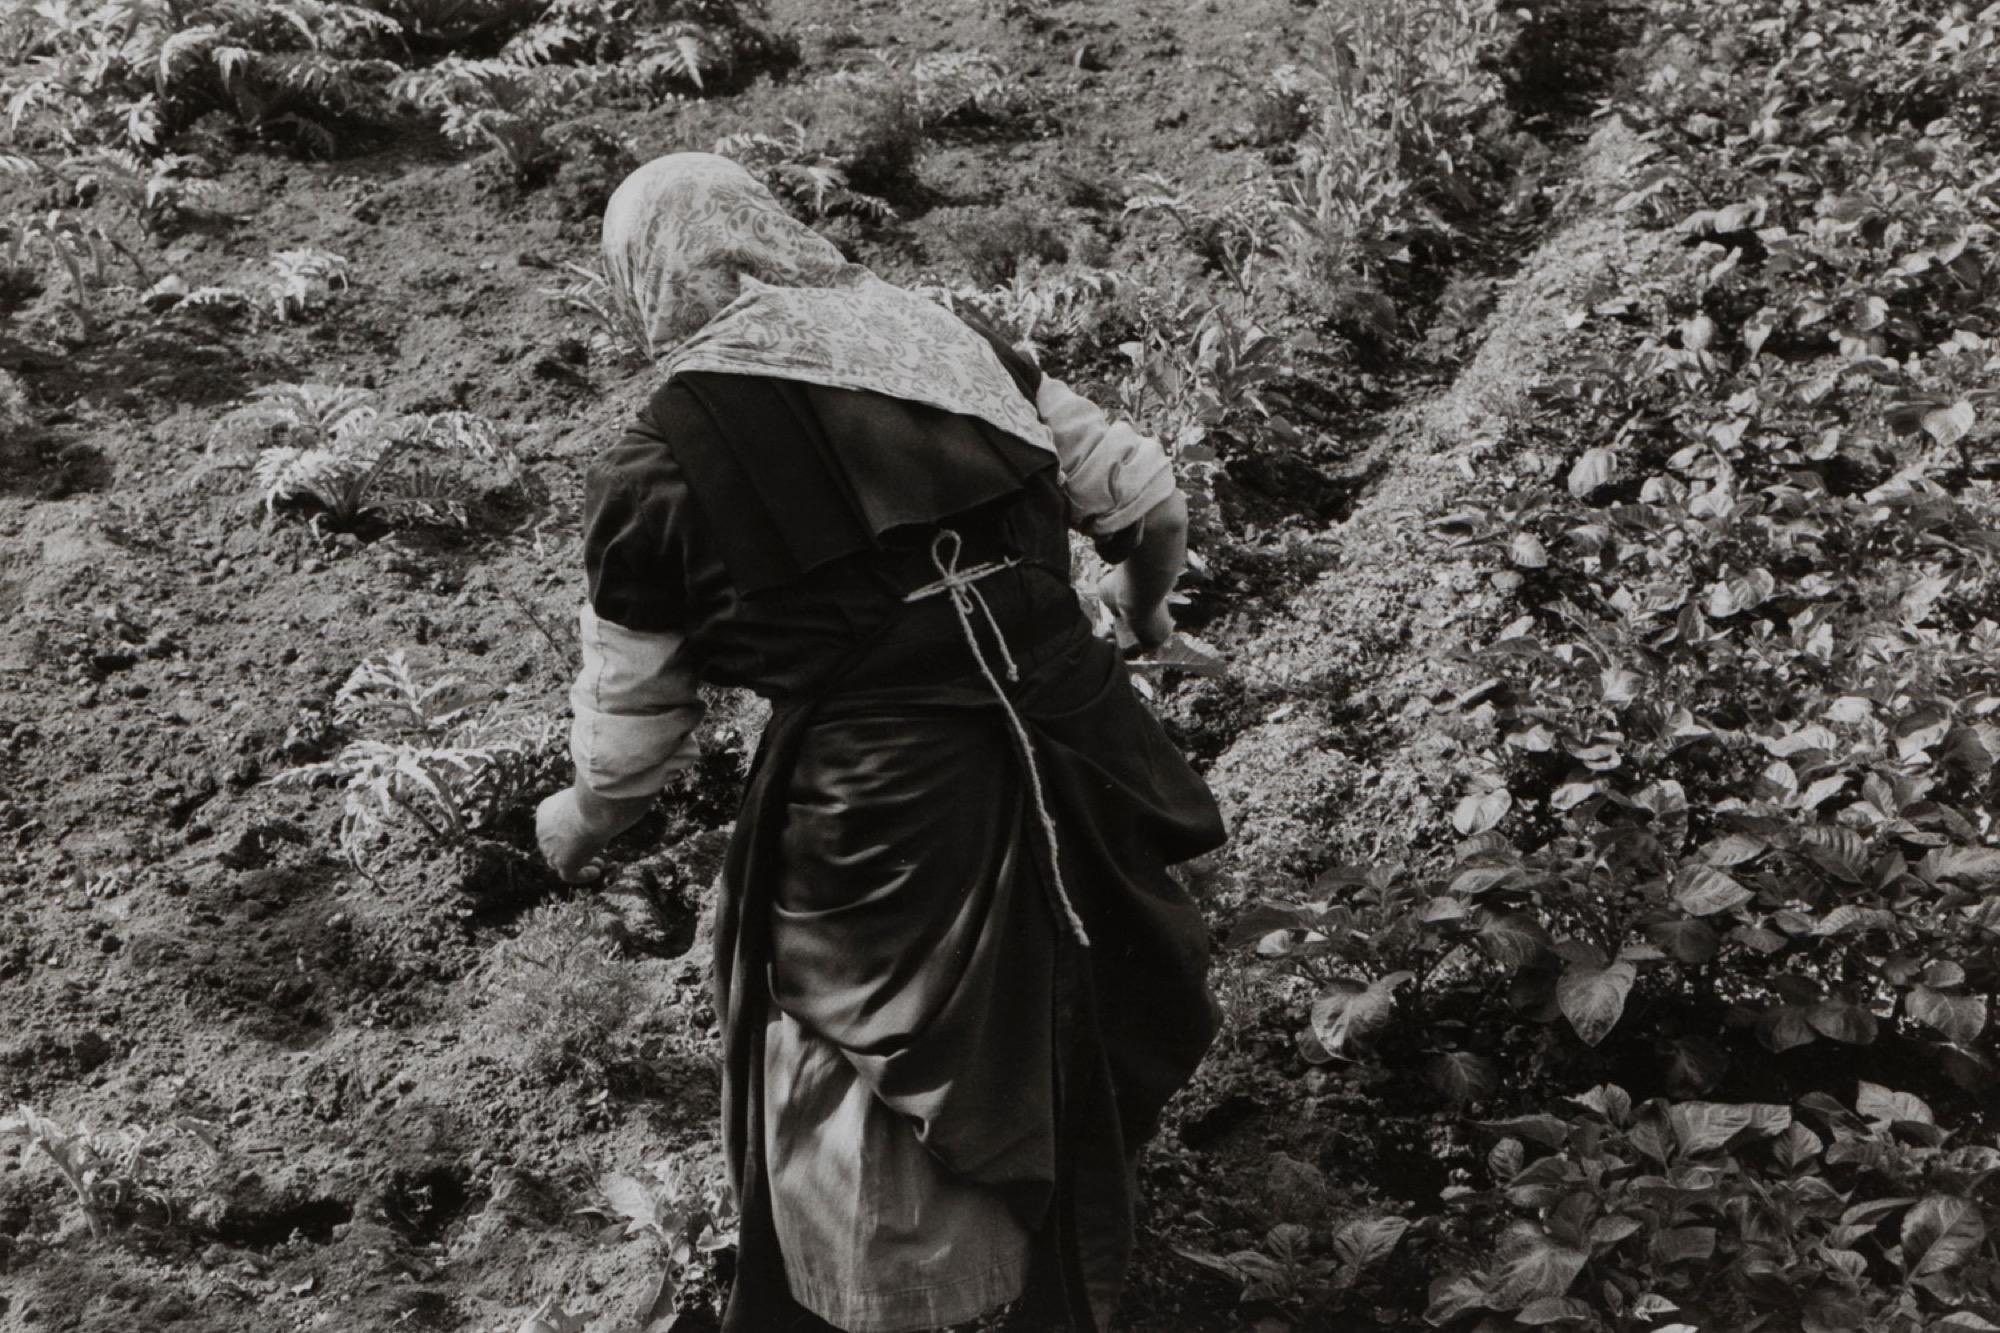 Edouard Boubat (1923-1999) - Untitled (Countrywoman), years 1950 - Two gelatin [...] - Image 2 of 3